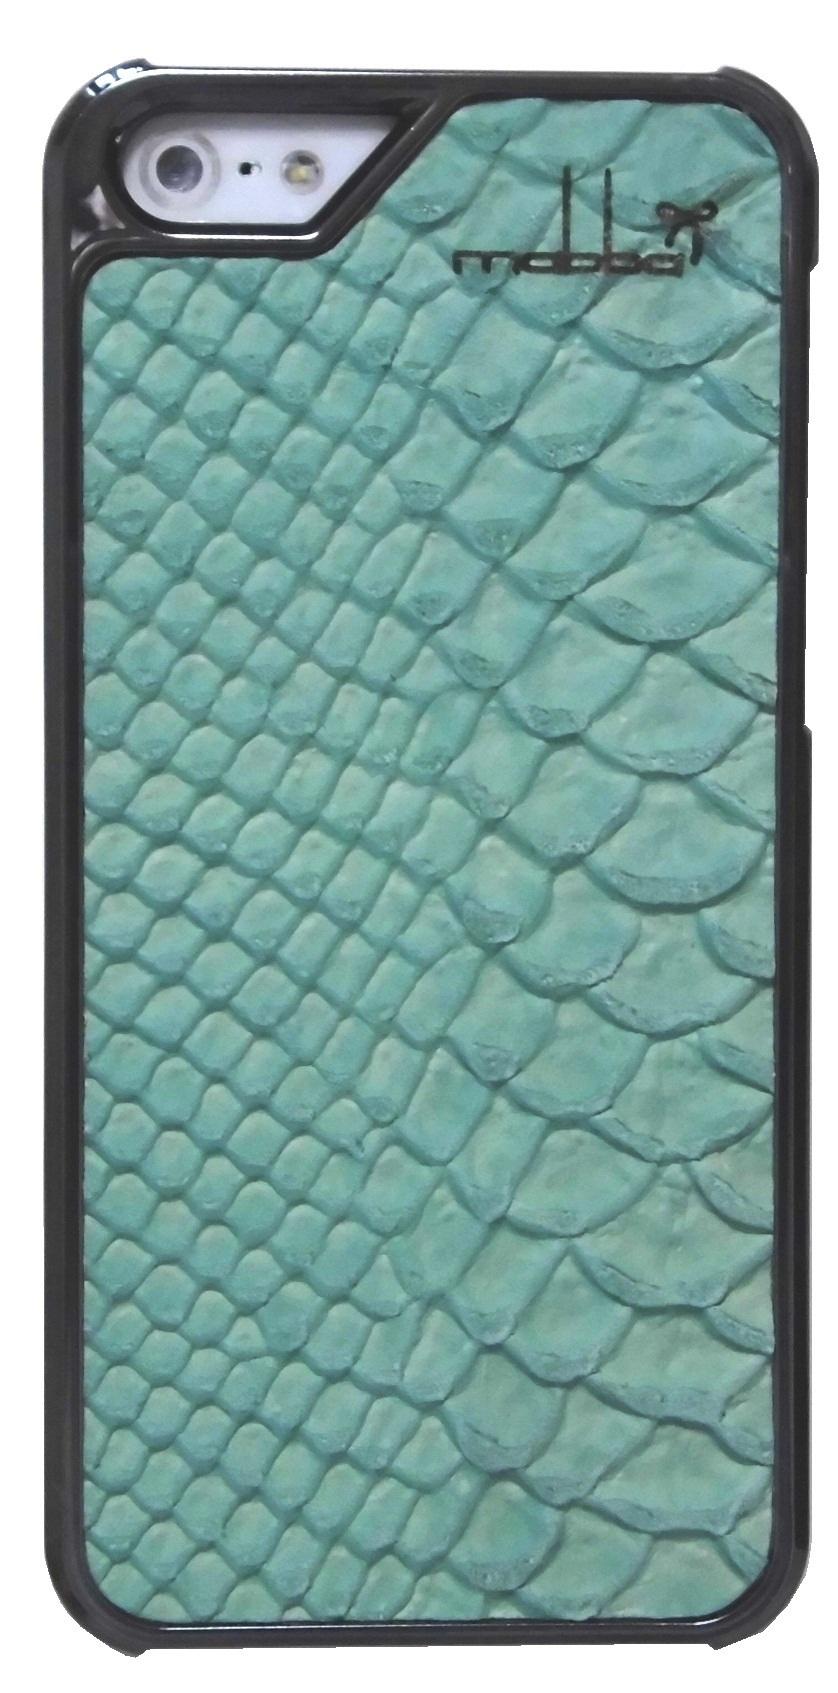 iPhone 5 5s Case Leder Mrs Laguna chrome (2)